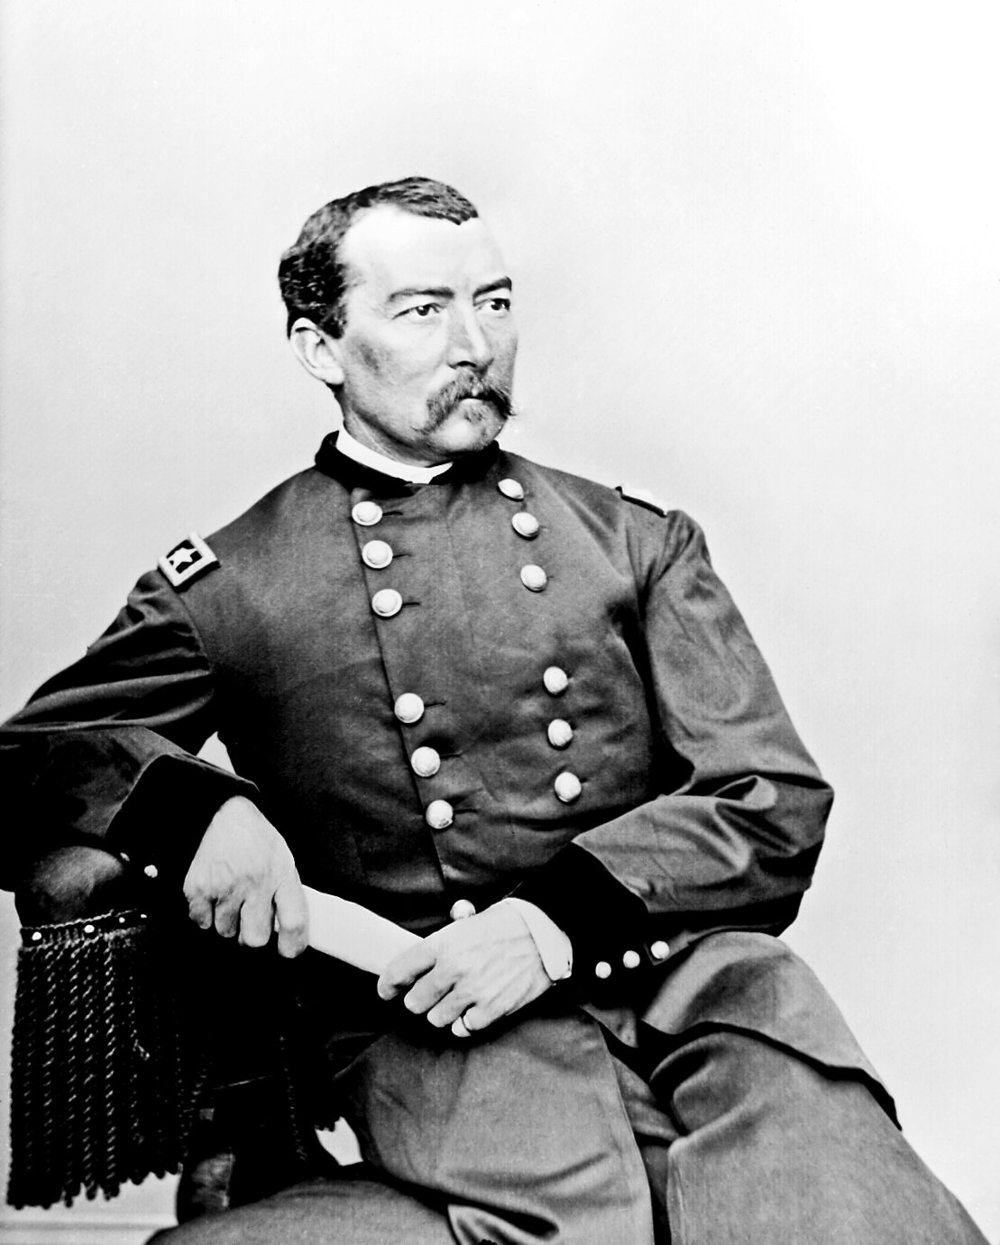 Union Gen. Philip Sheridan finally secured the Editors release in August, 1864